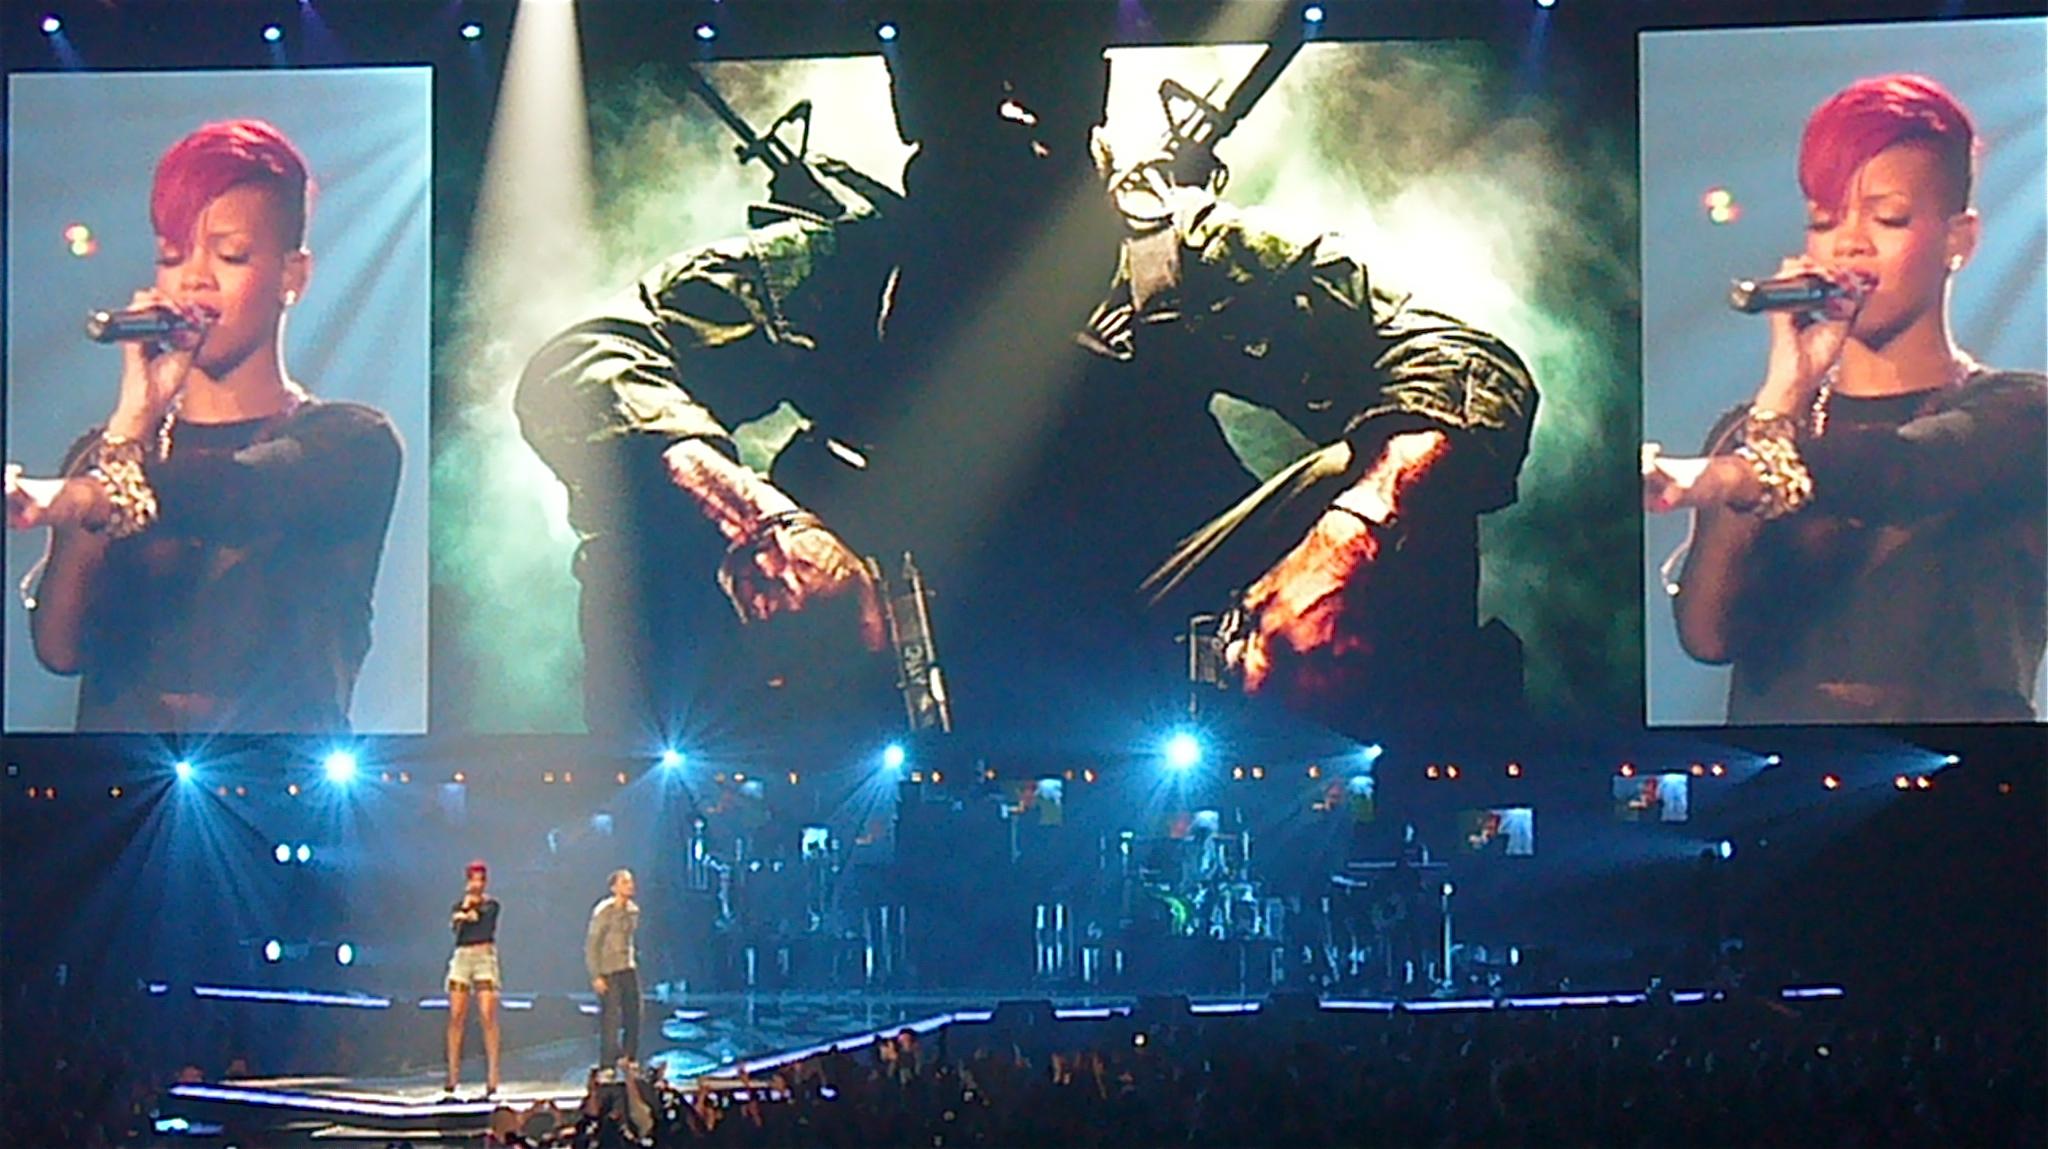 Rihanna And Eminem Tour